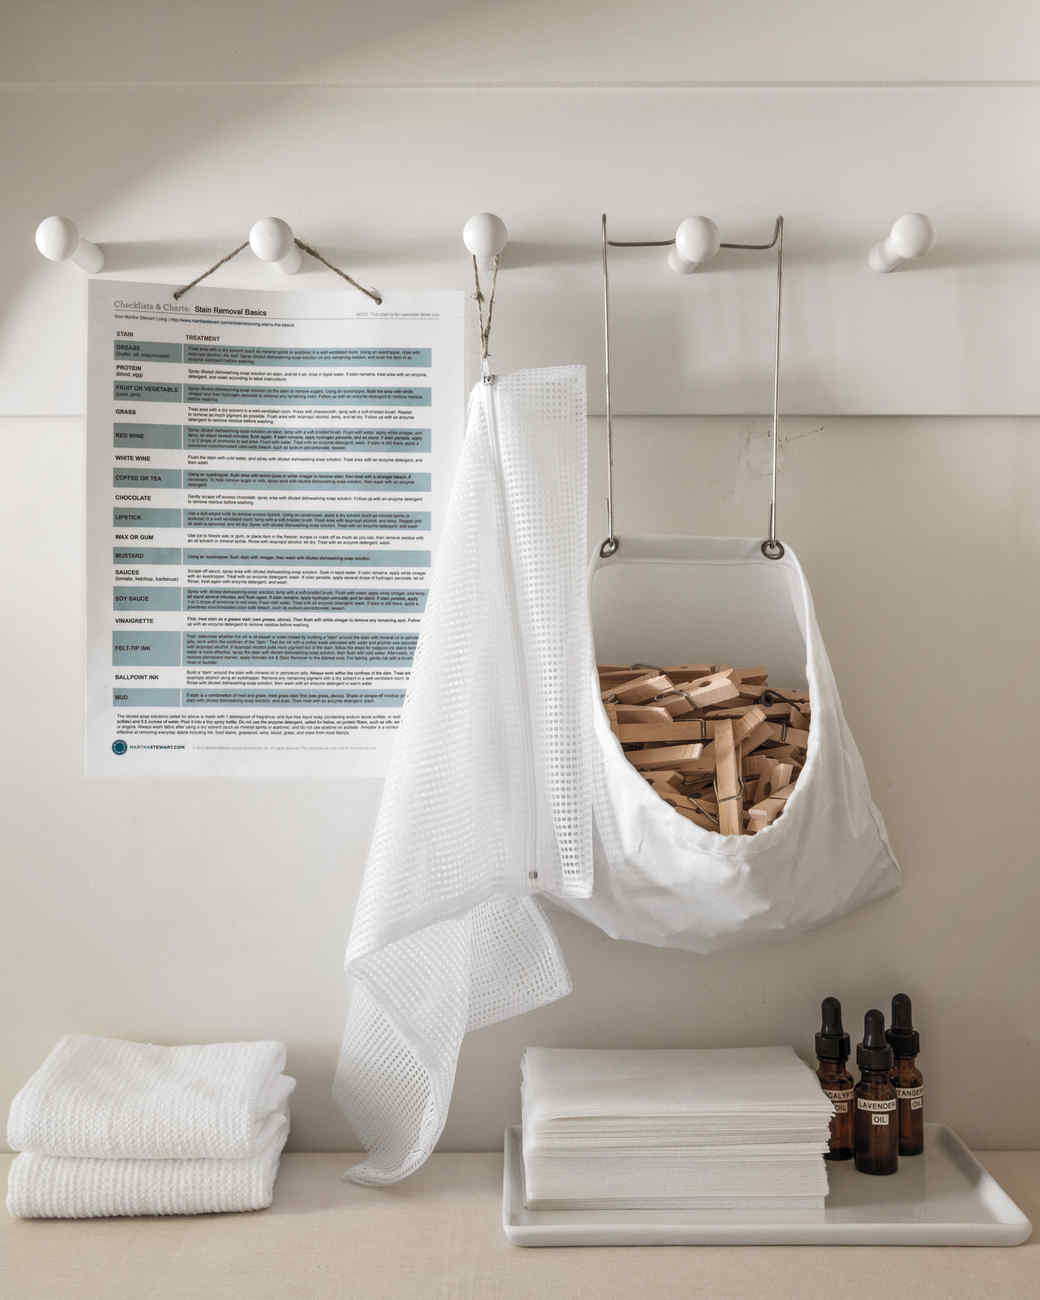 laundry-room-104-md110733.jpg